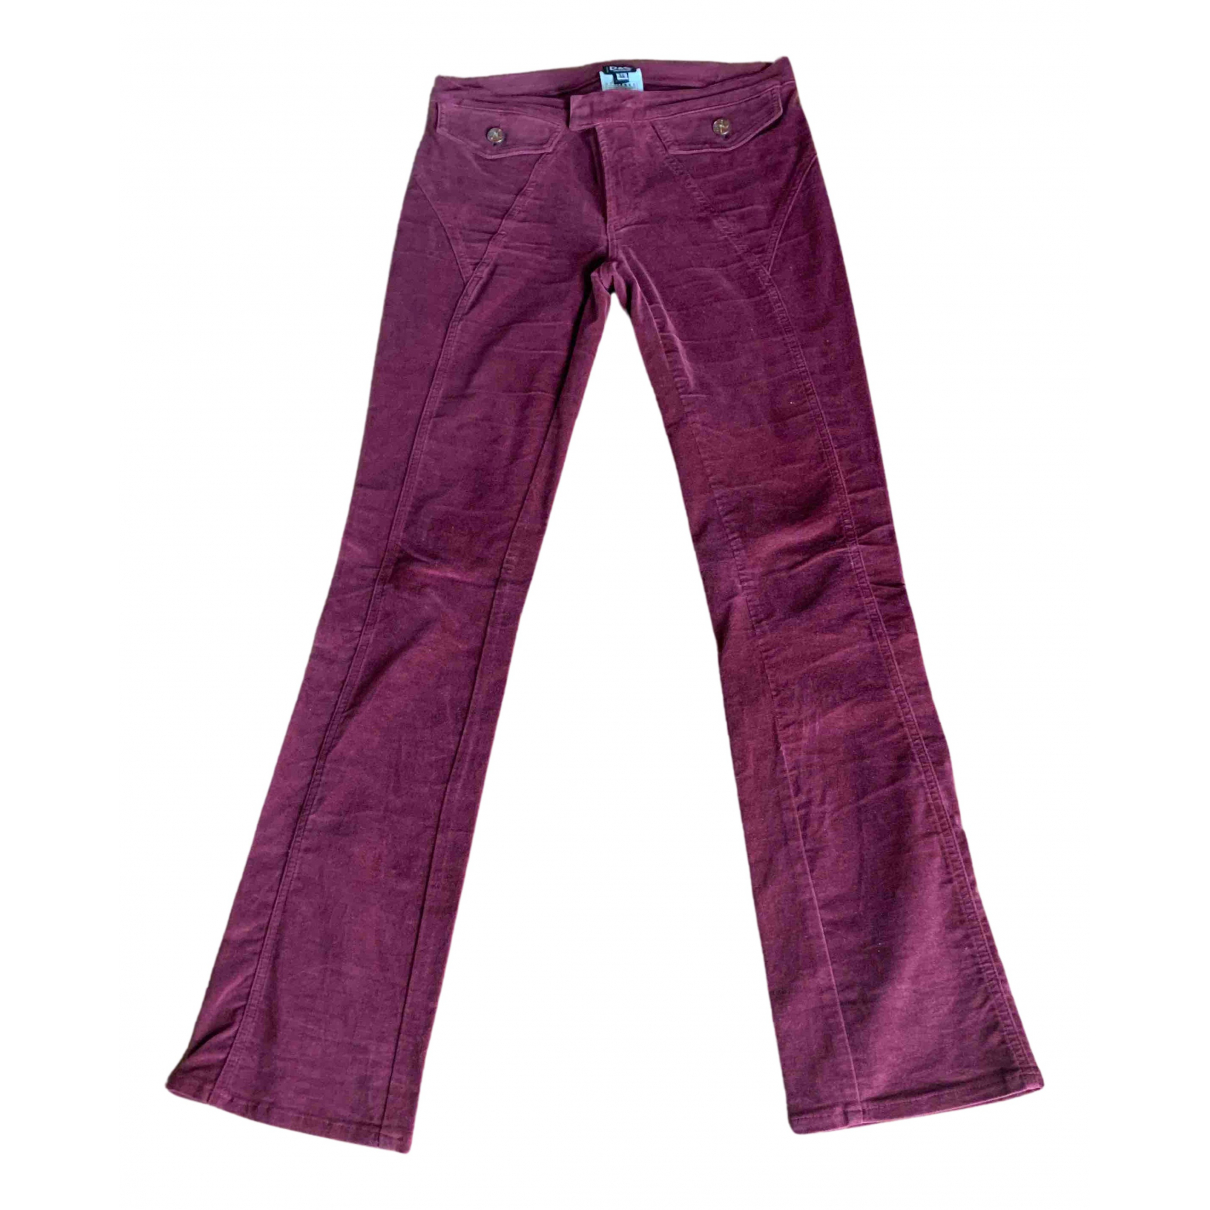 Dolce & Gabbana N Burgundy Cotton Trousers for Women 40 IT